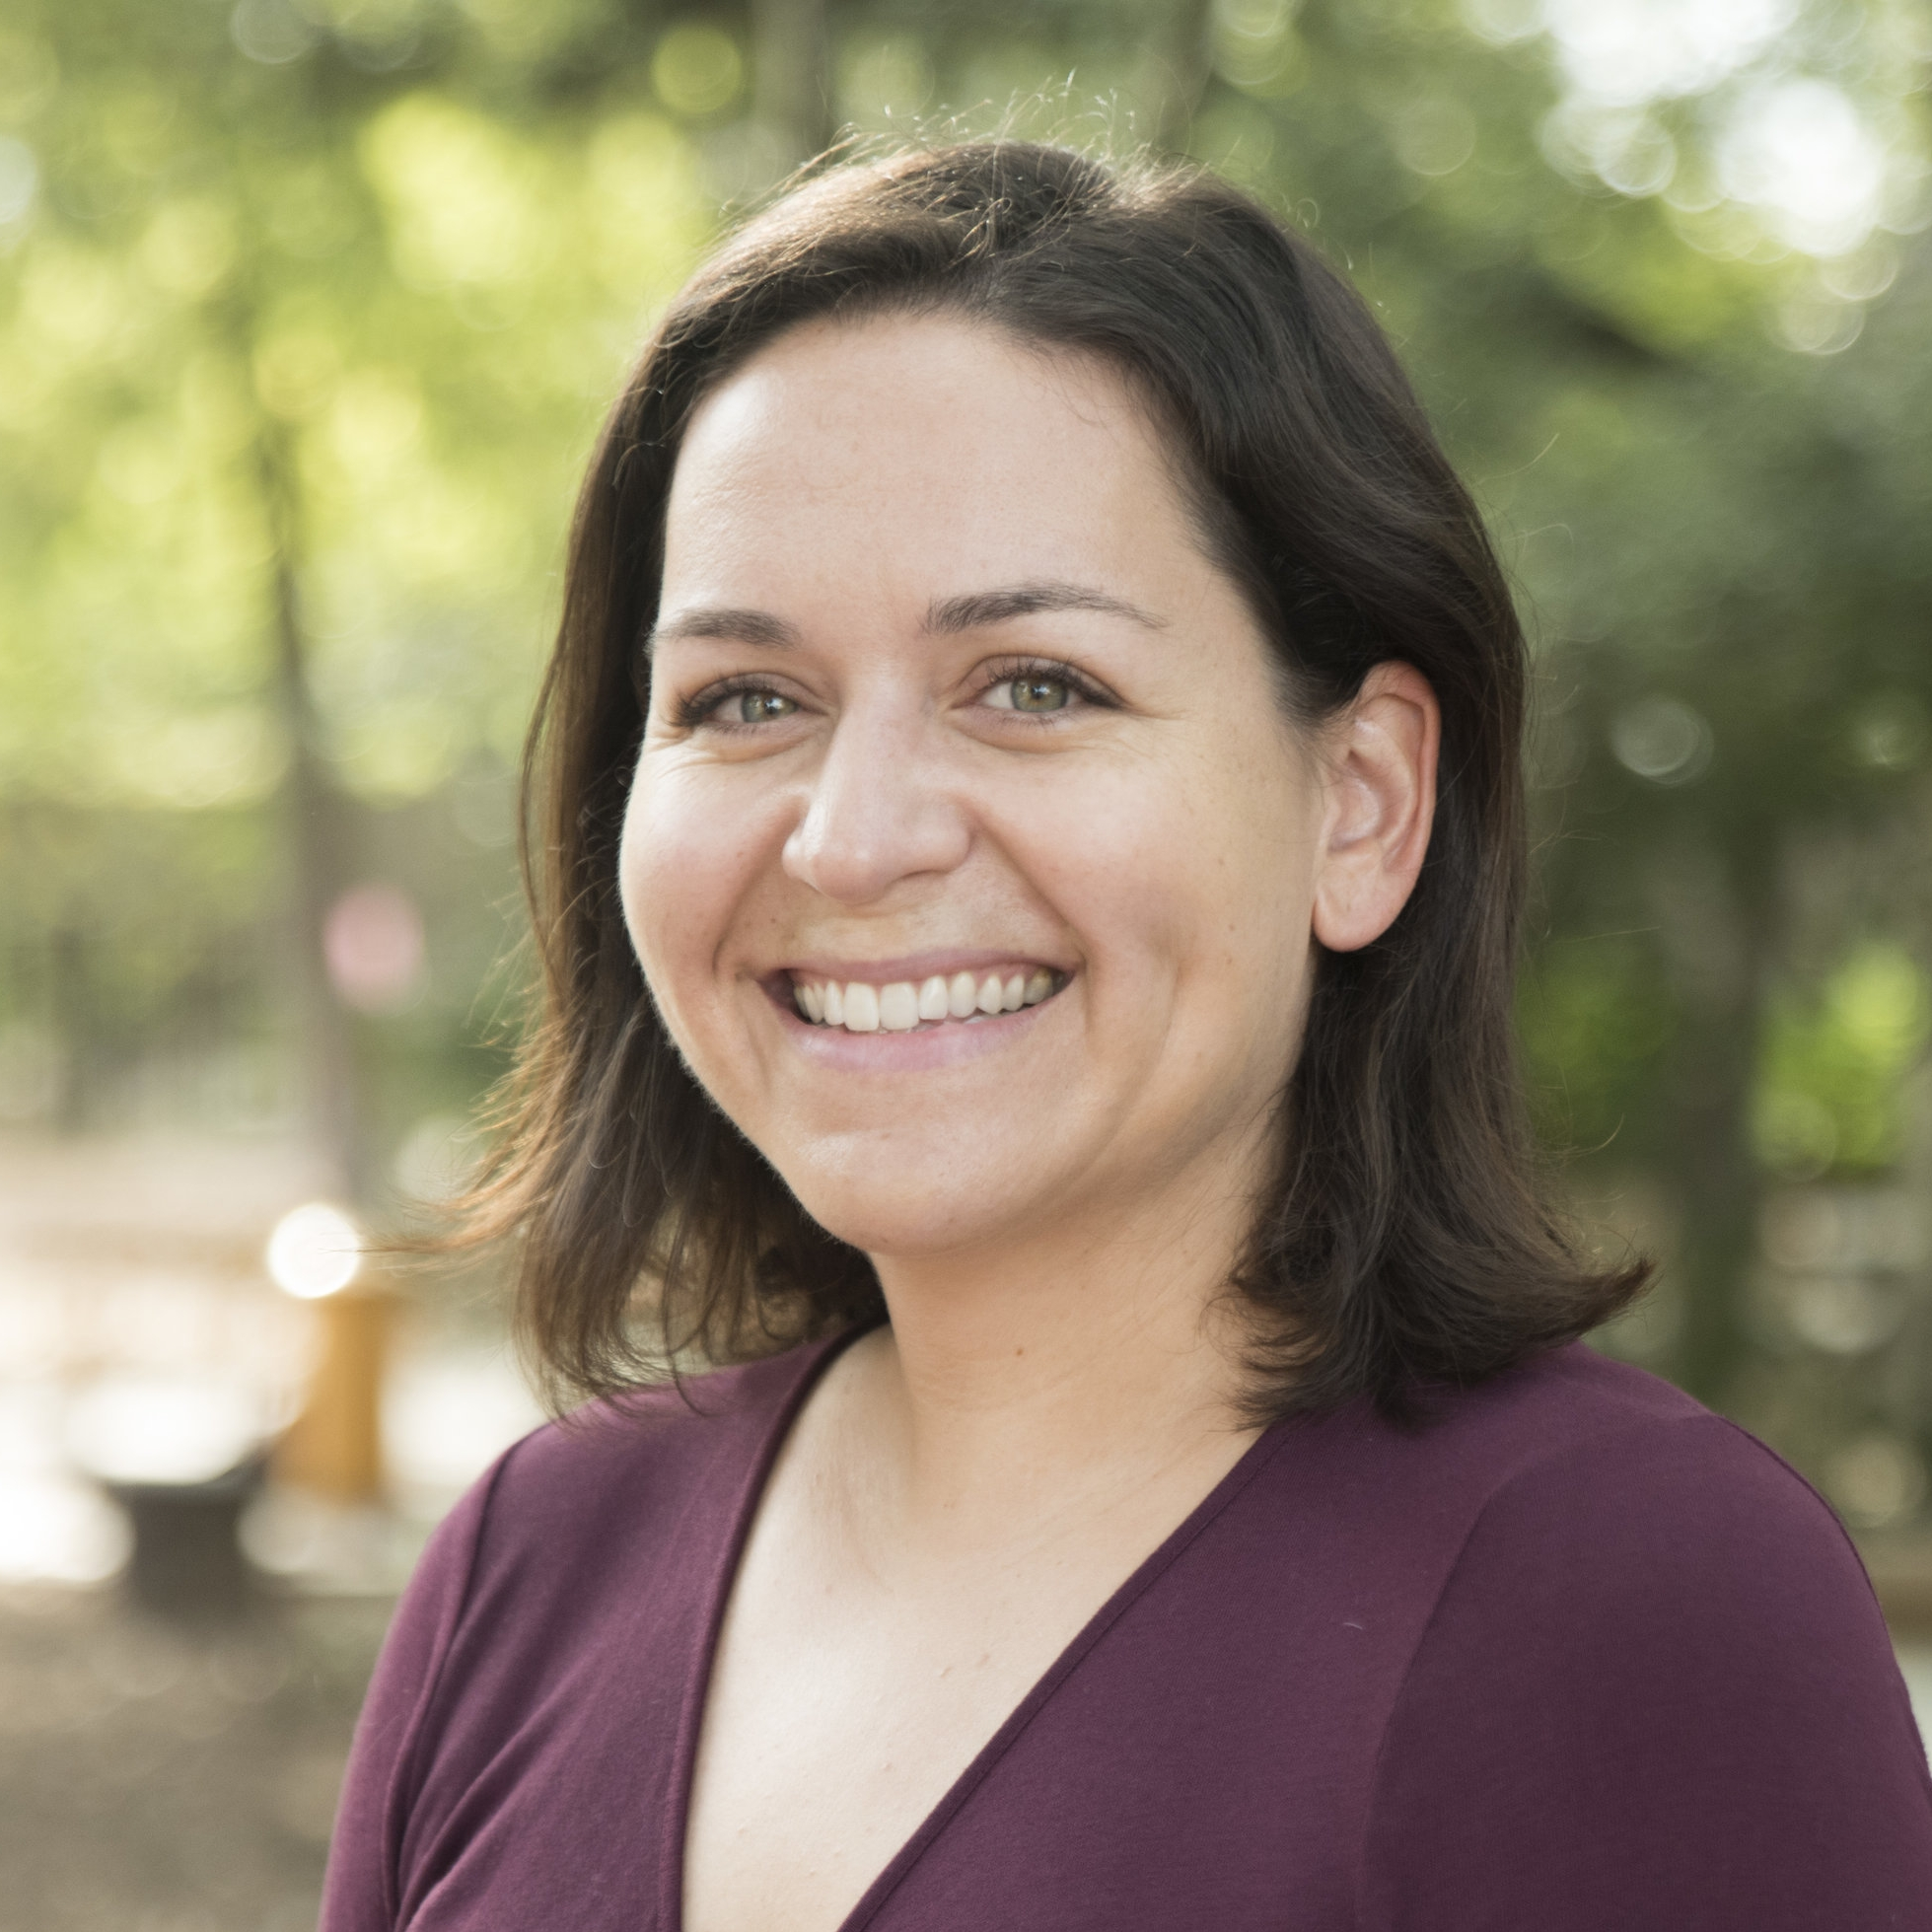 Lacey Glenewinkel - is a teaching assistant